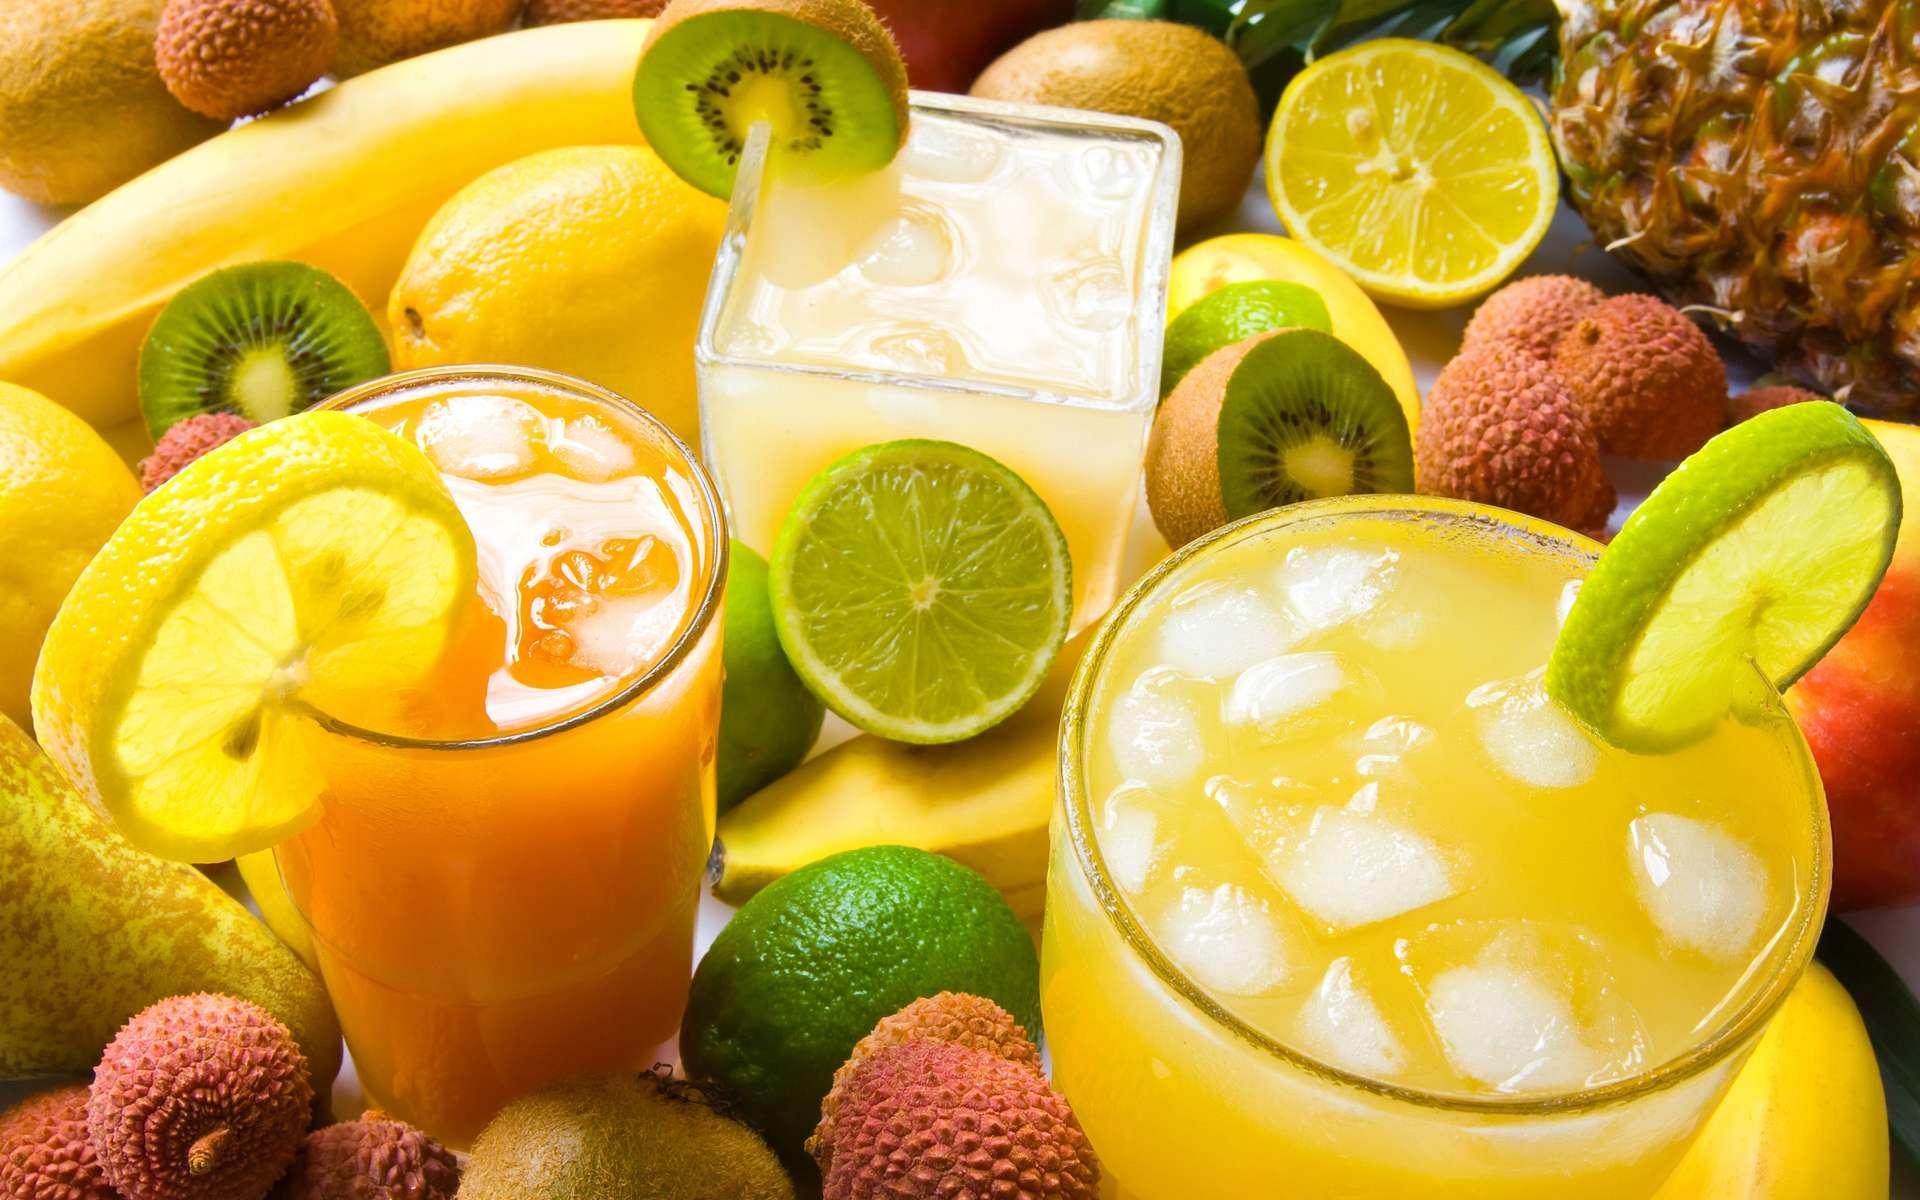 коктейль, лимон, апельсин